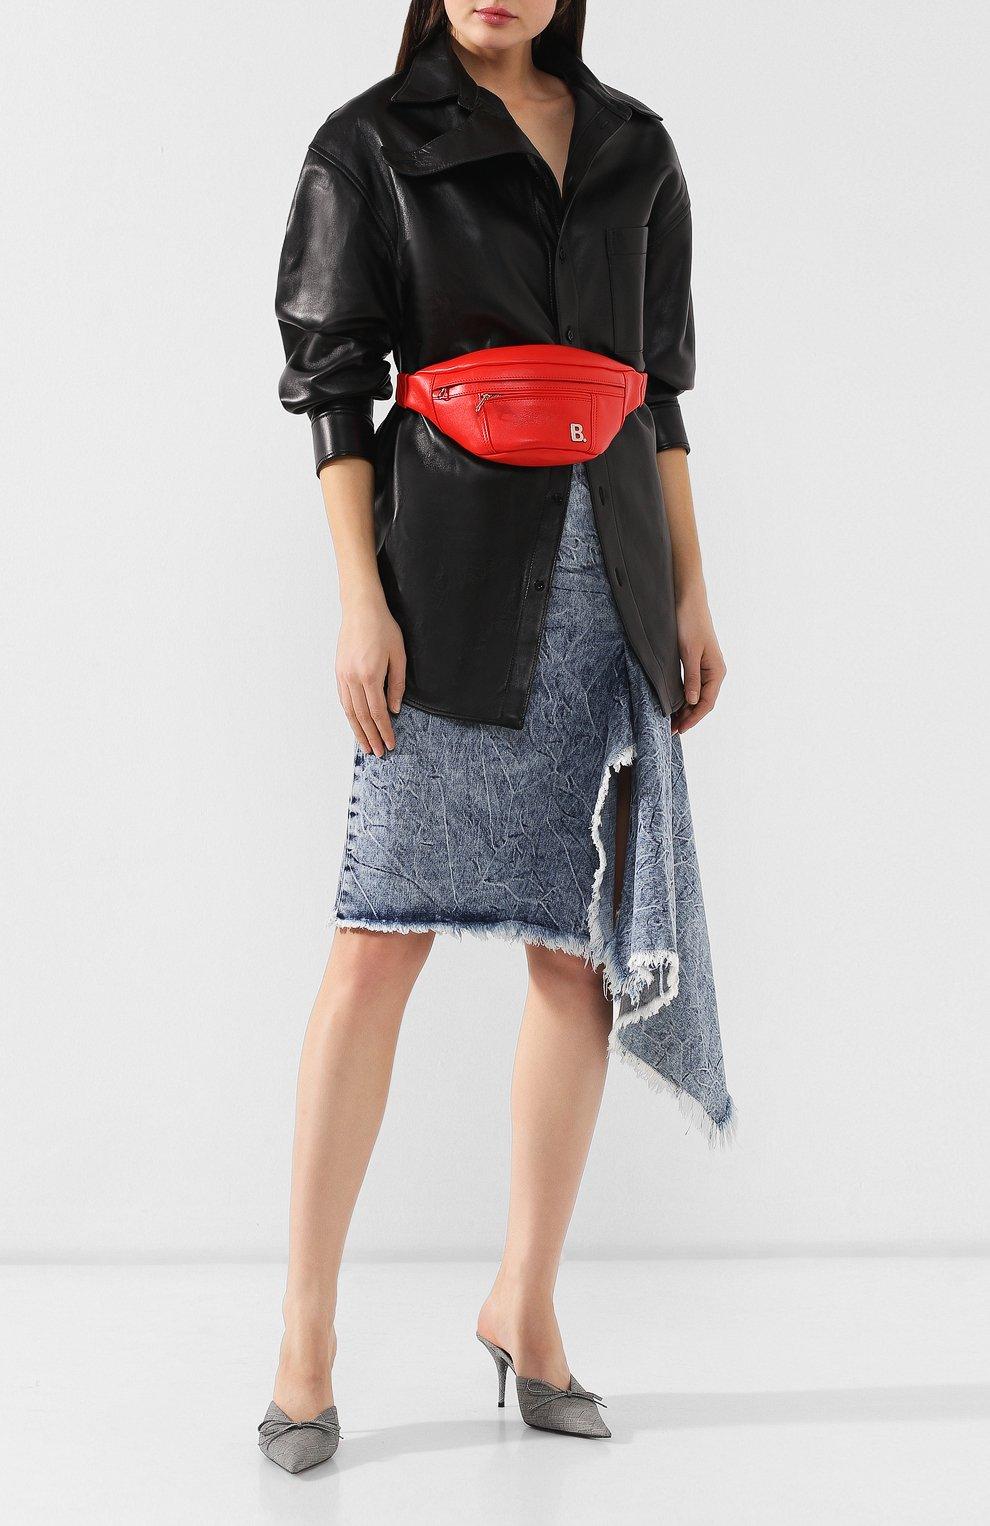 Поясная сумка Soft XS Balenciaga красная | Фото №2